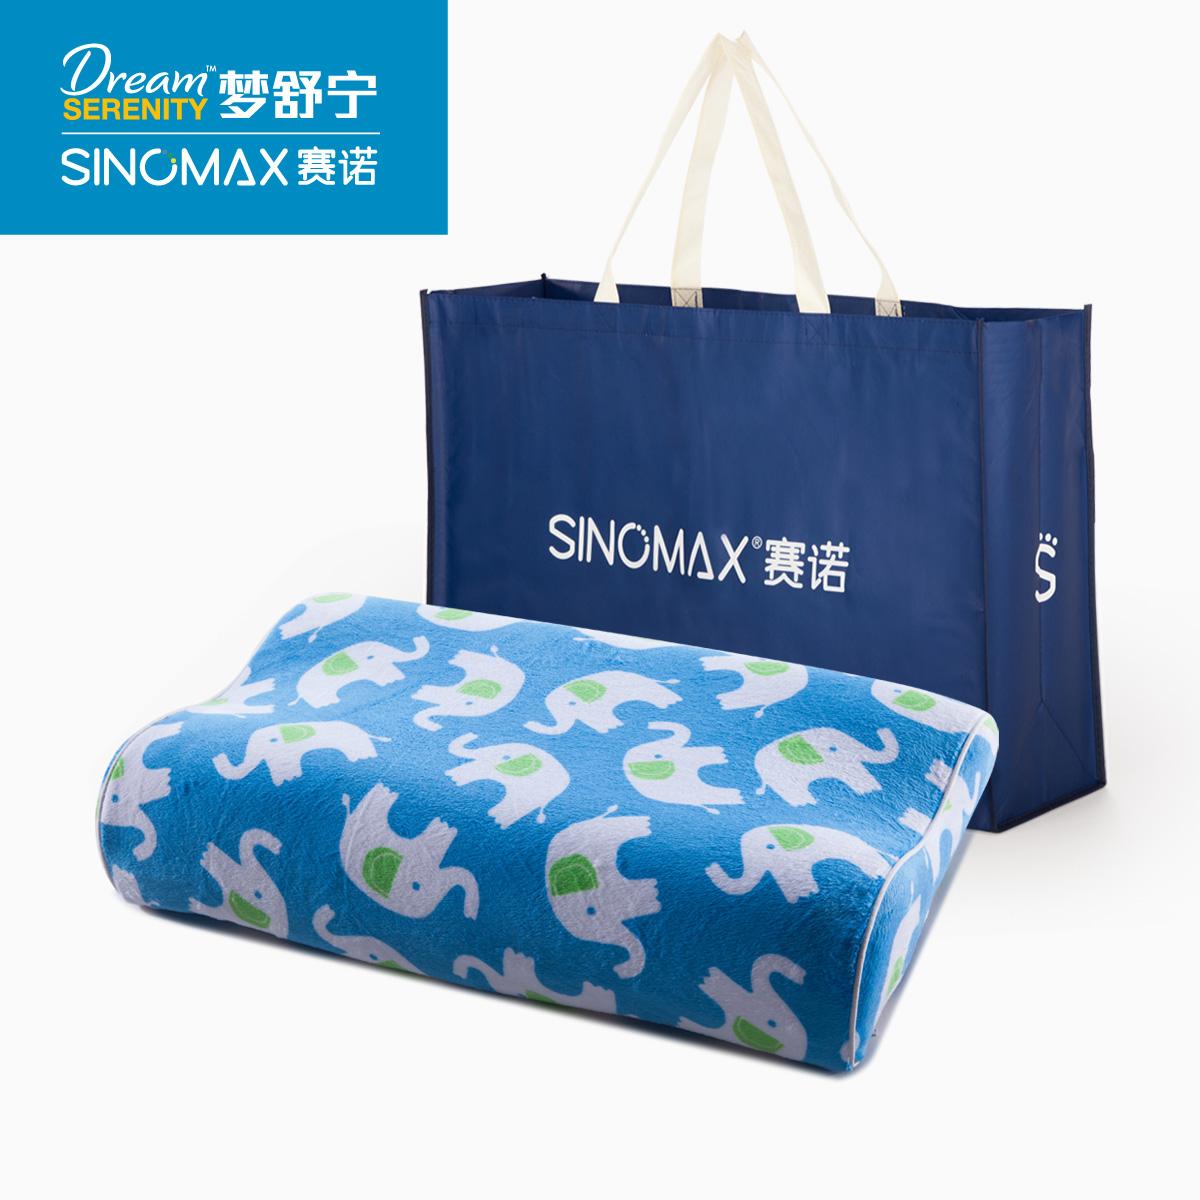 Детская подушка Sinomax fp157 1-3-10